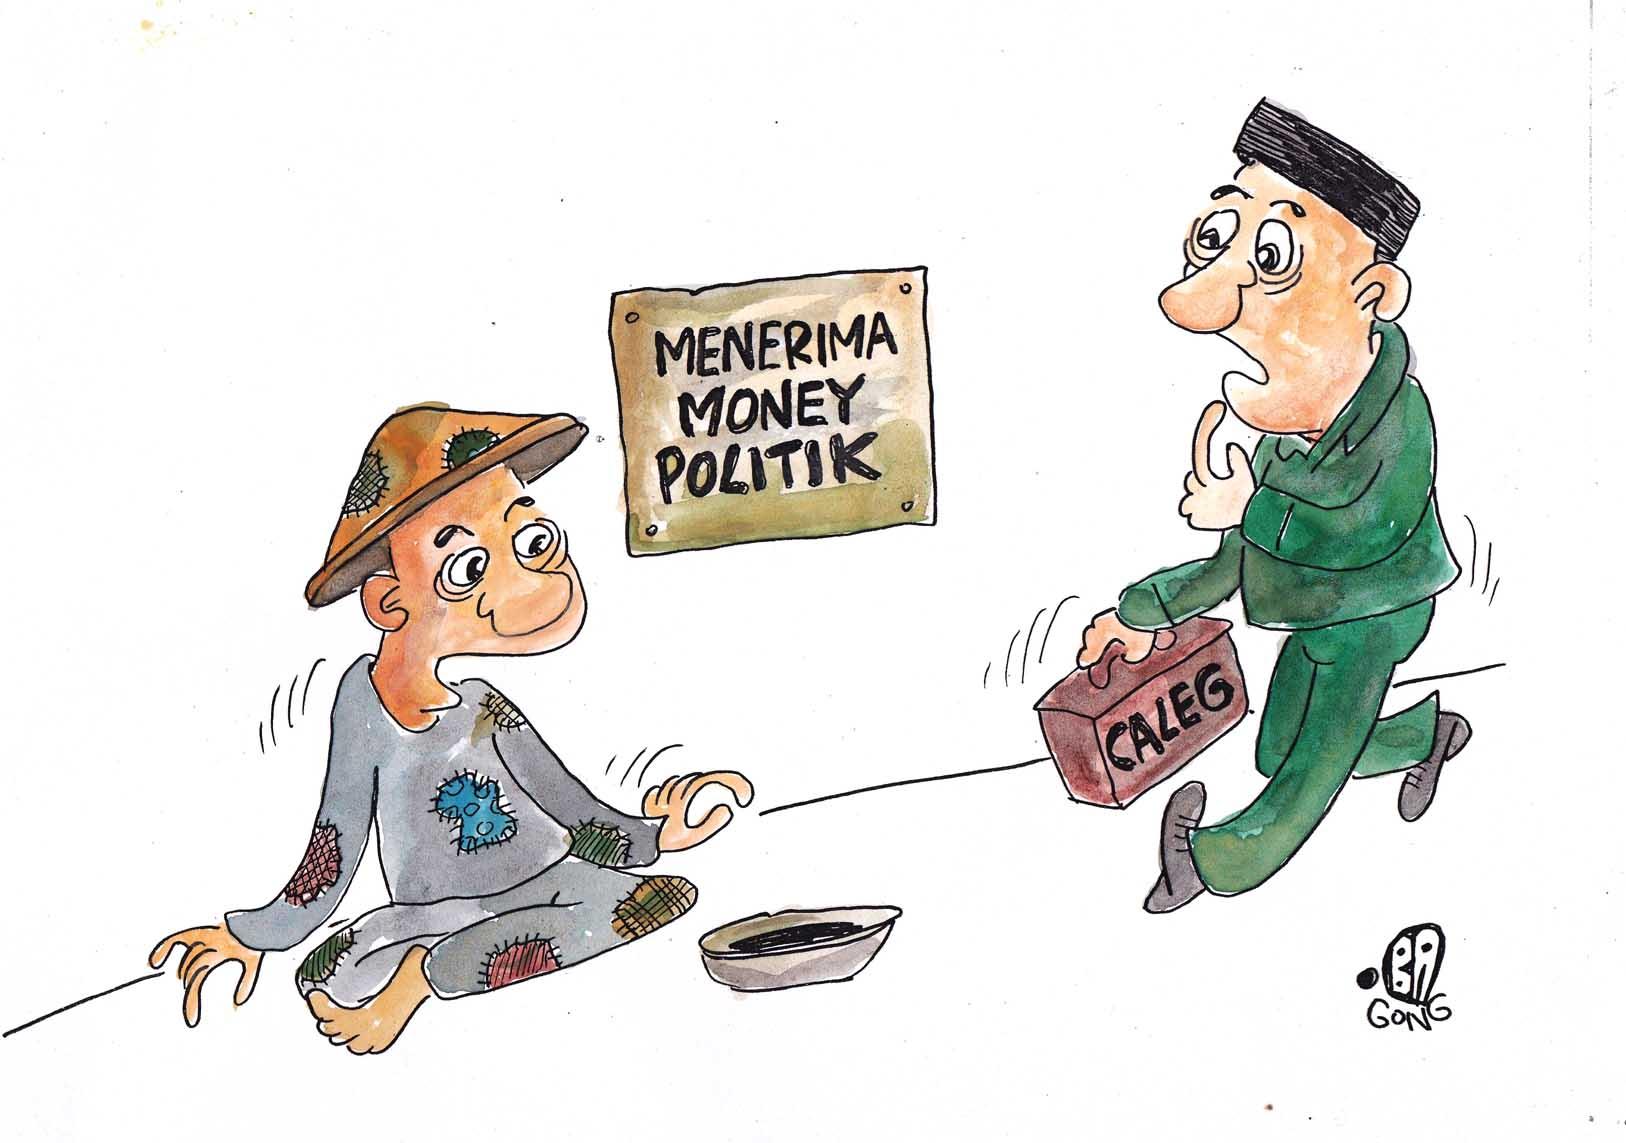 kartun 1 money politik